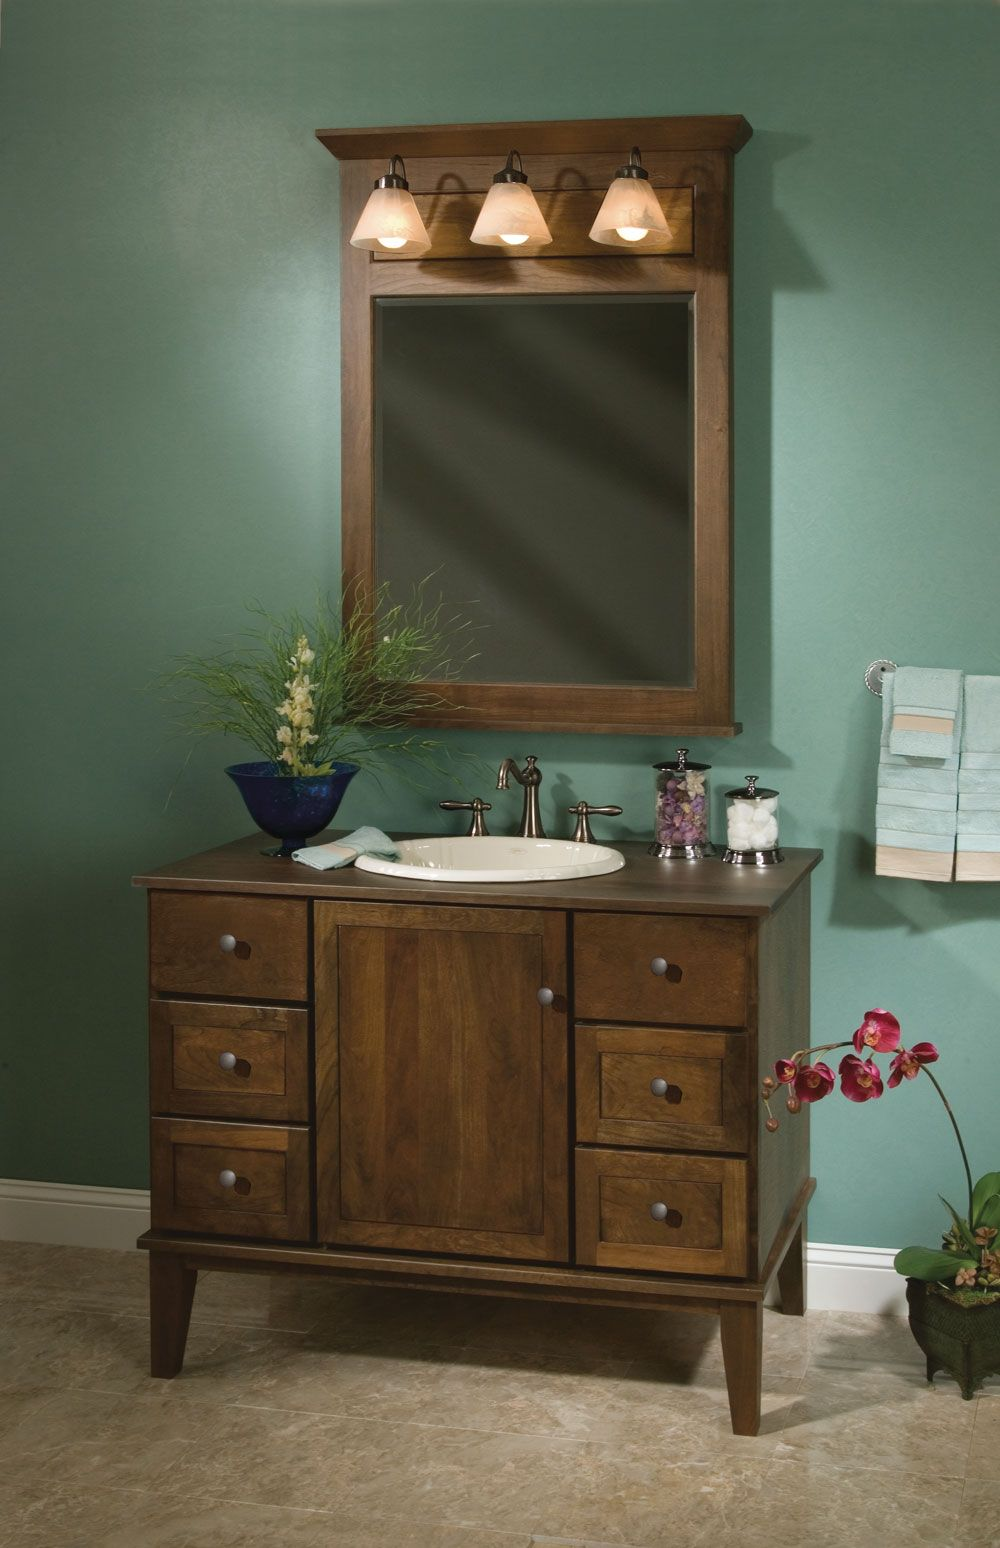 Badezimmer eitelkeit shaker stil springhill  inch cherry wood dark color  wood pro  pinterest